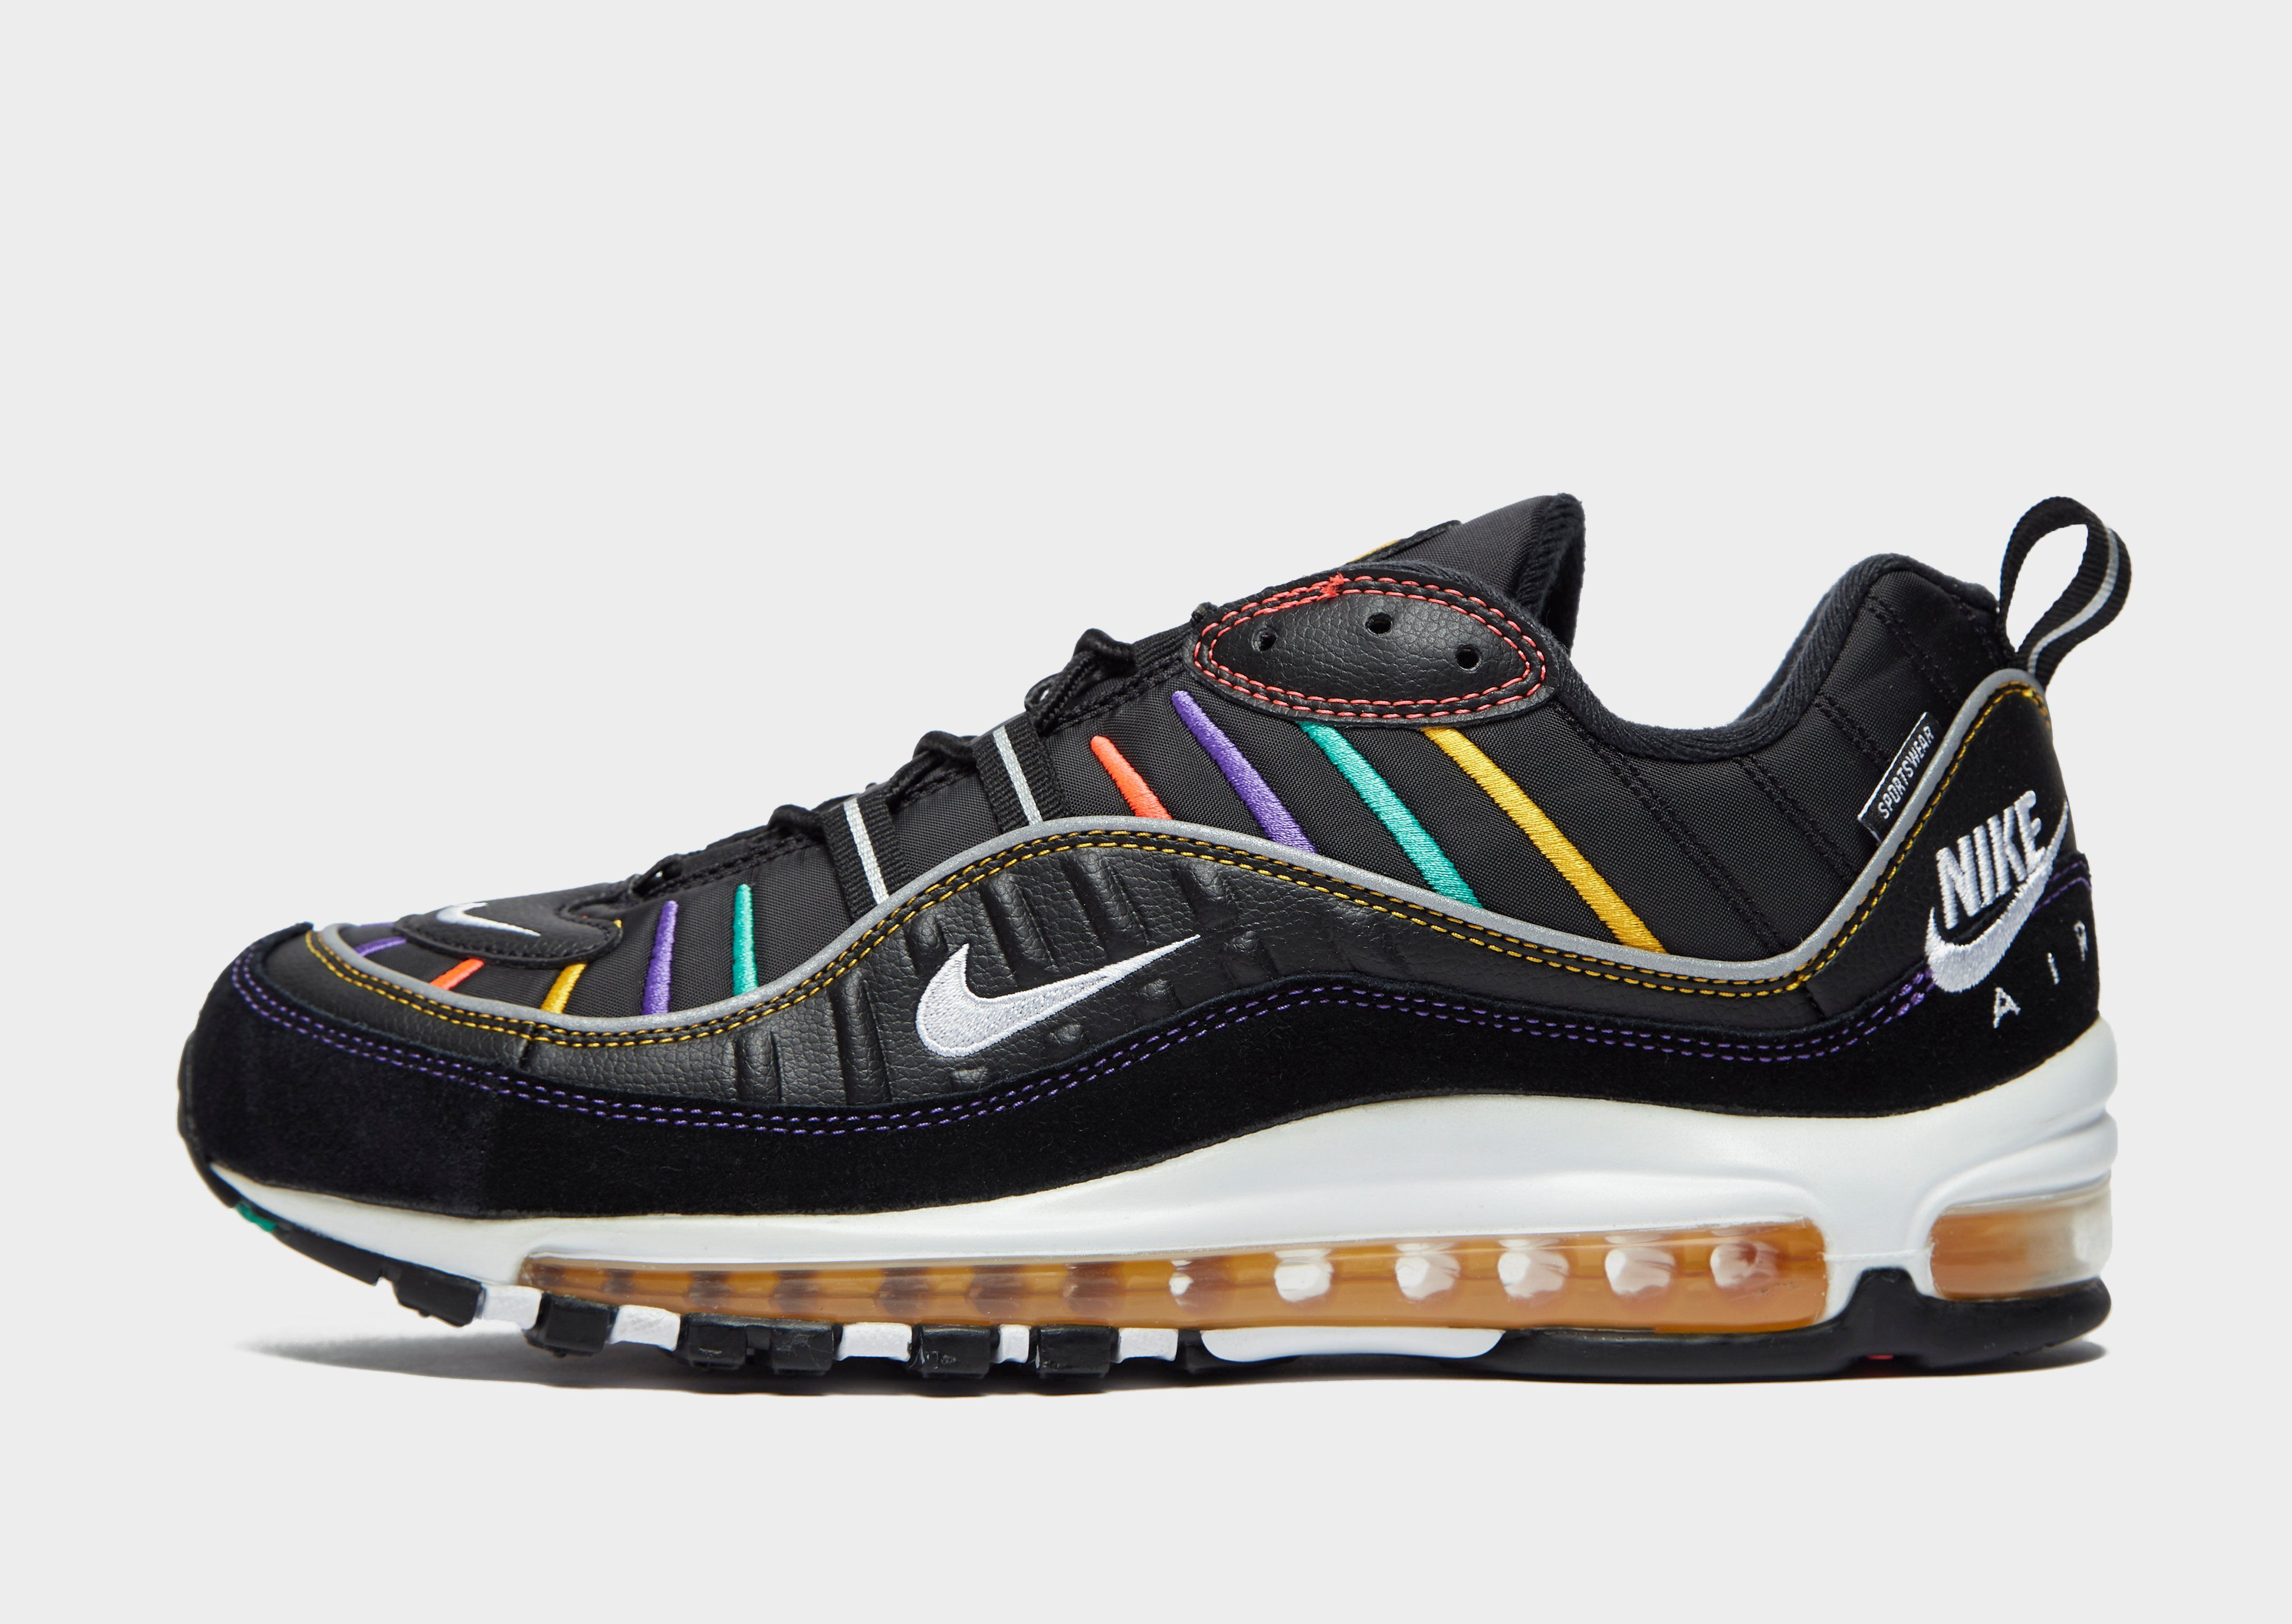 acheter populaire 81cf4 96b6b Nike Air Max 98 Premium | JD Sports